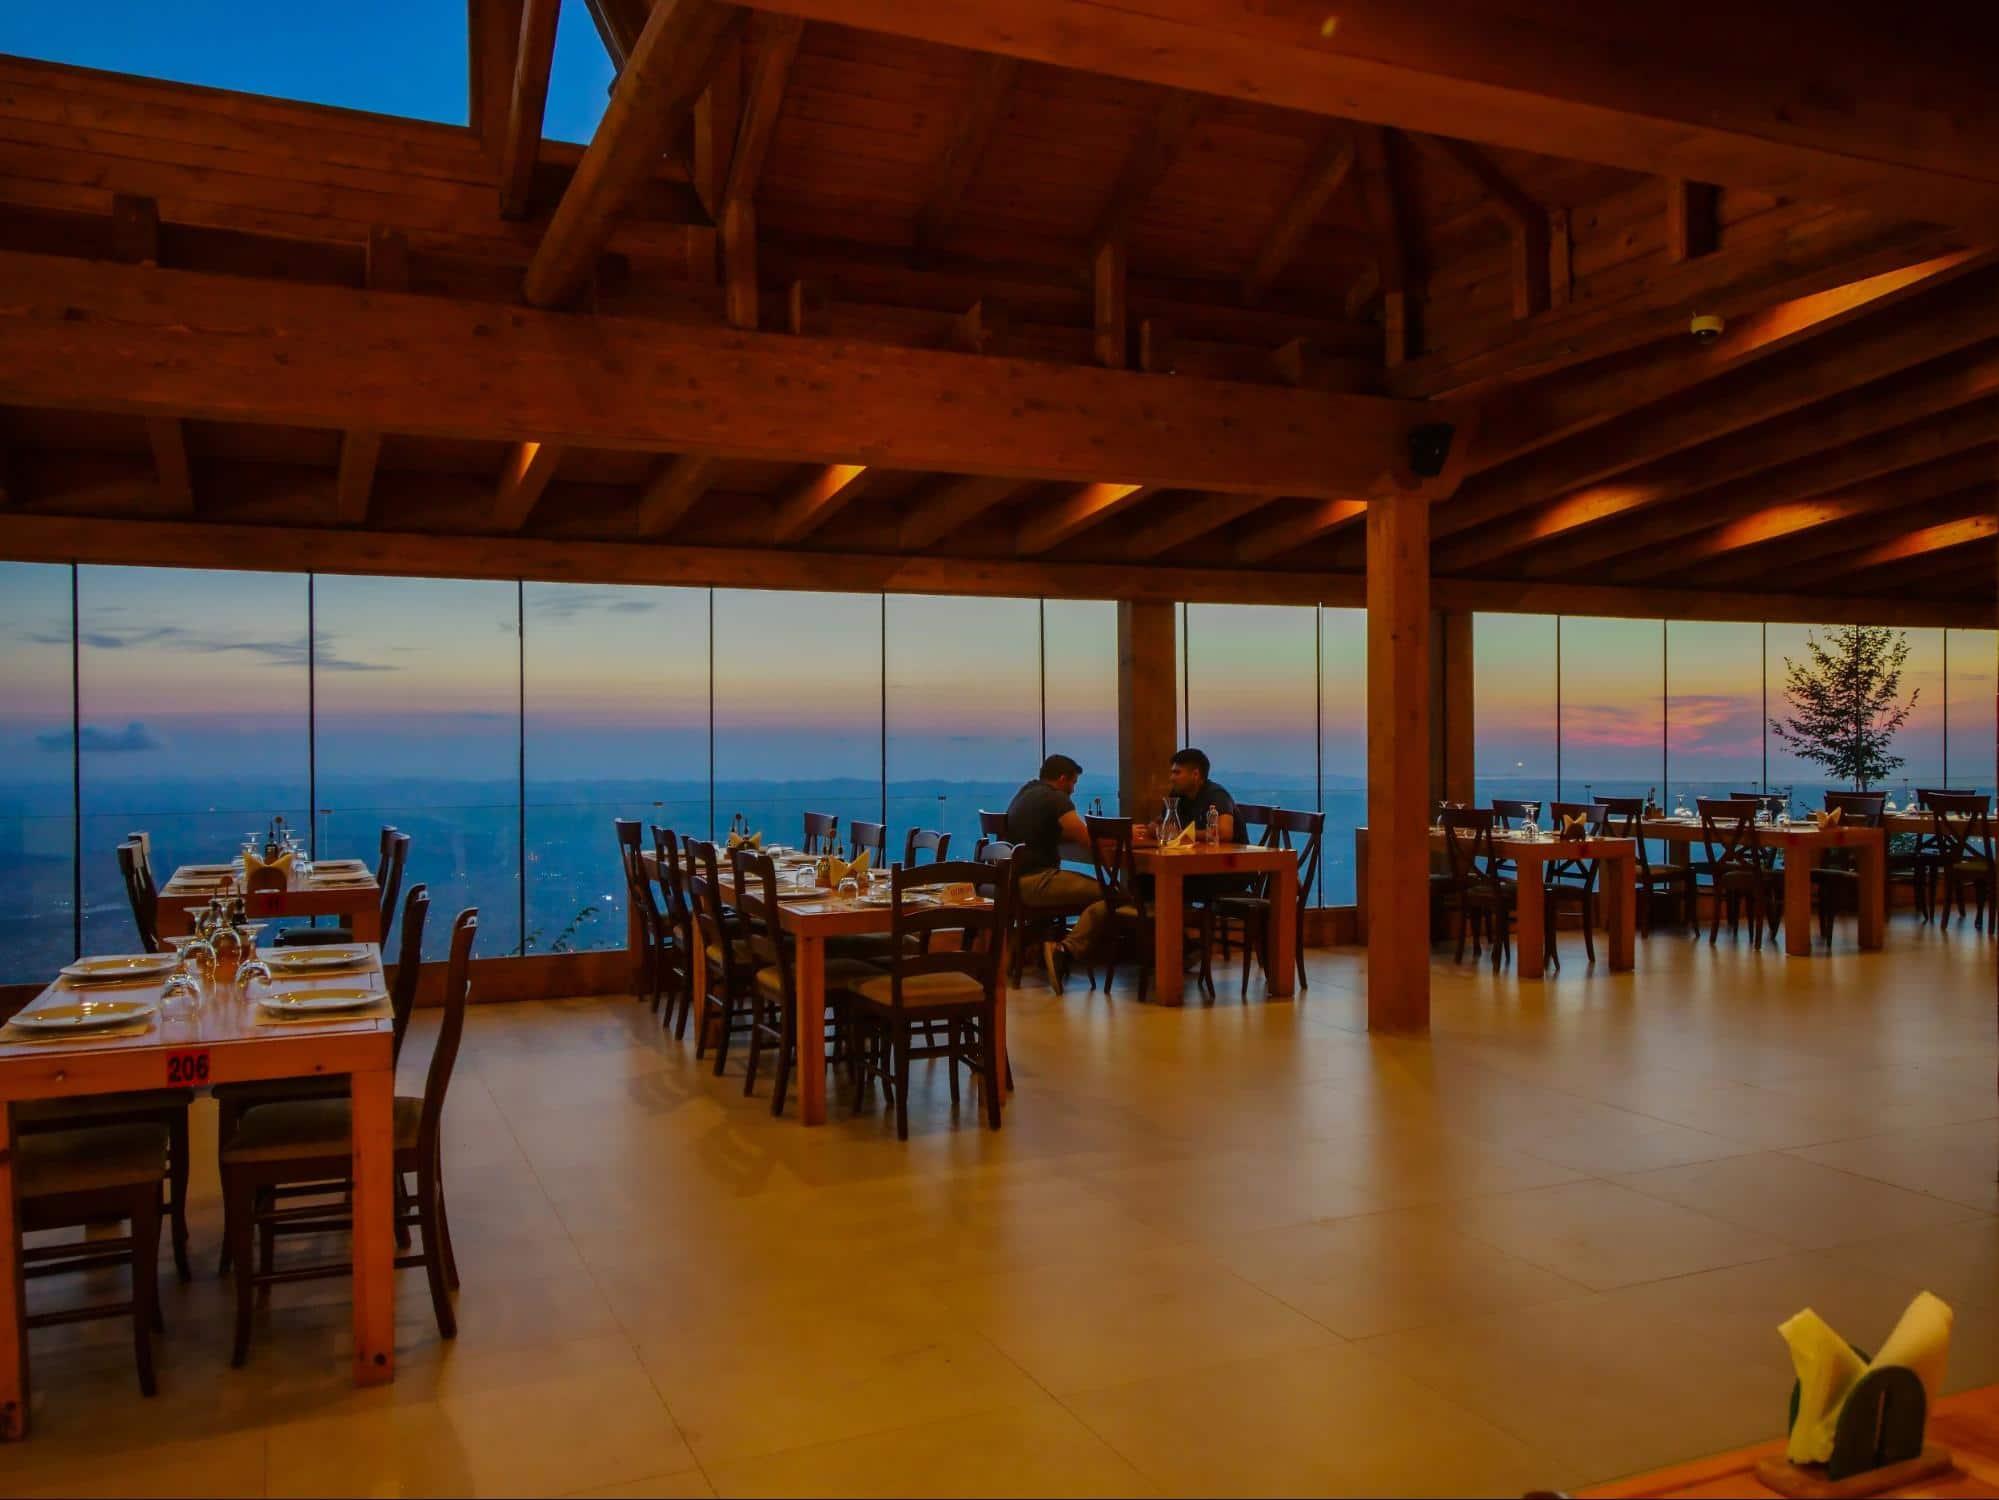 Sunset views from Dajti Mountain edge restaurant